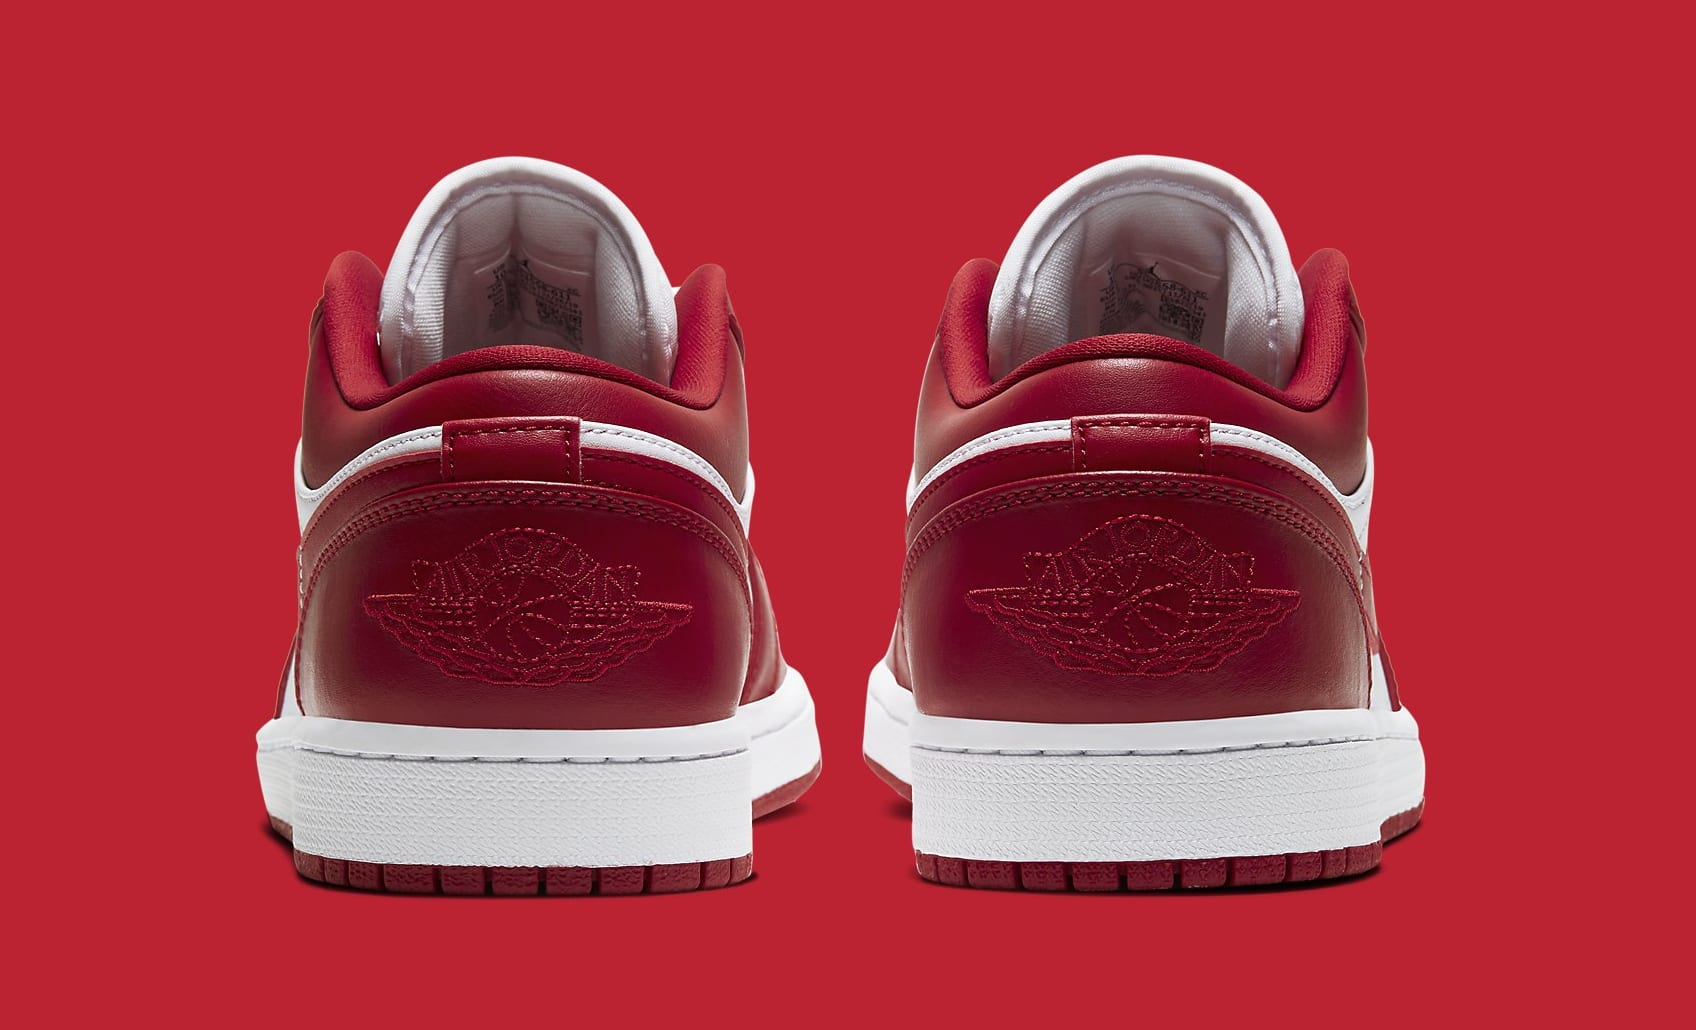 air-jordan-1-low-gym-red-553558-611-heel